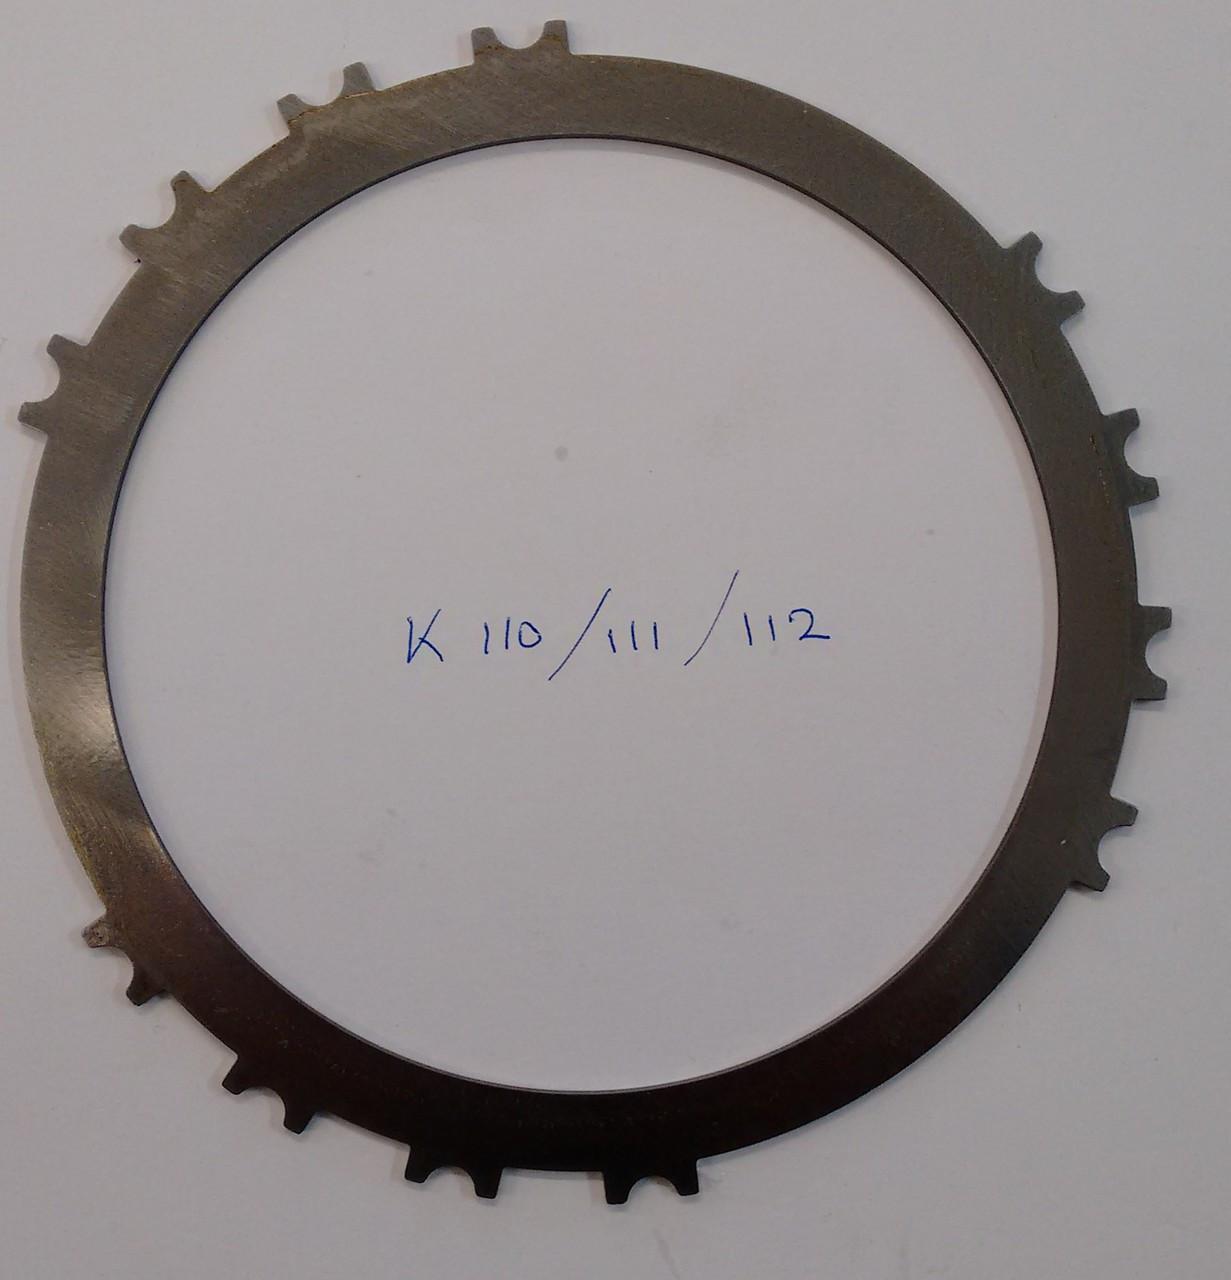 Reverse clutch Steel discs Toyota K110/111/112/112F CVT Transmission